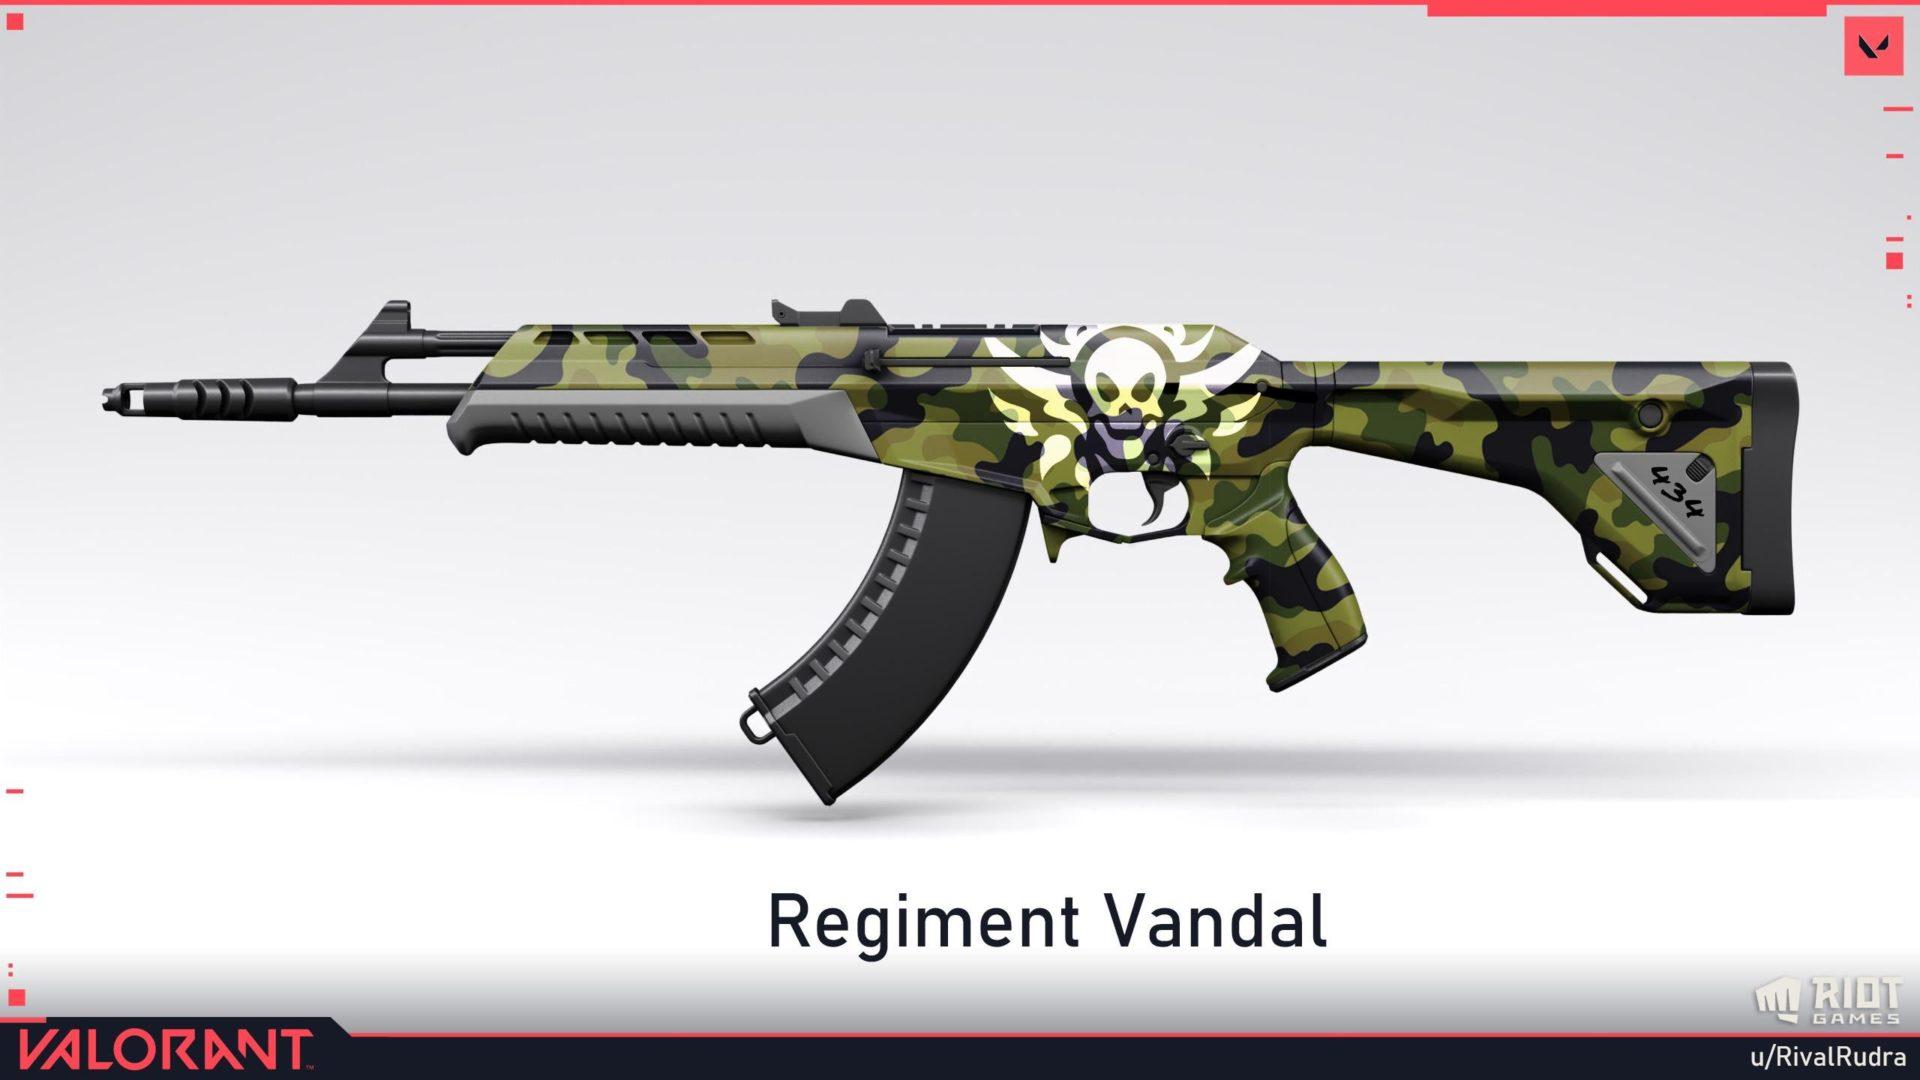 Valorant RivalRudra Regiment Skins